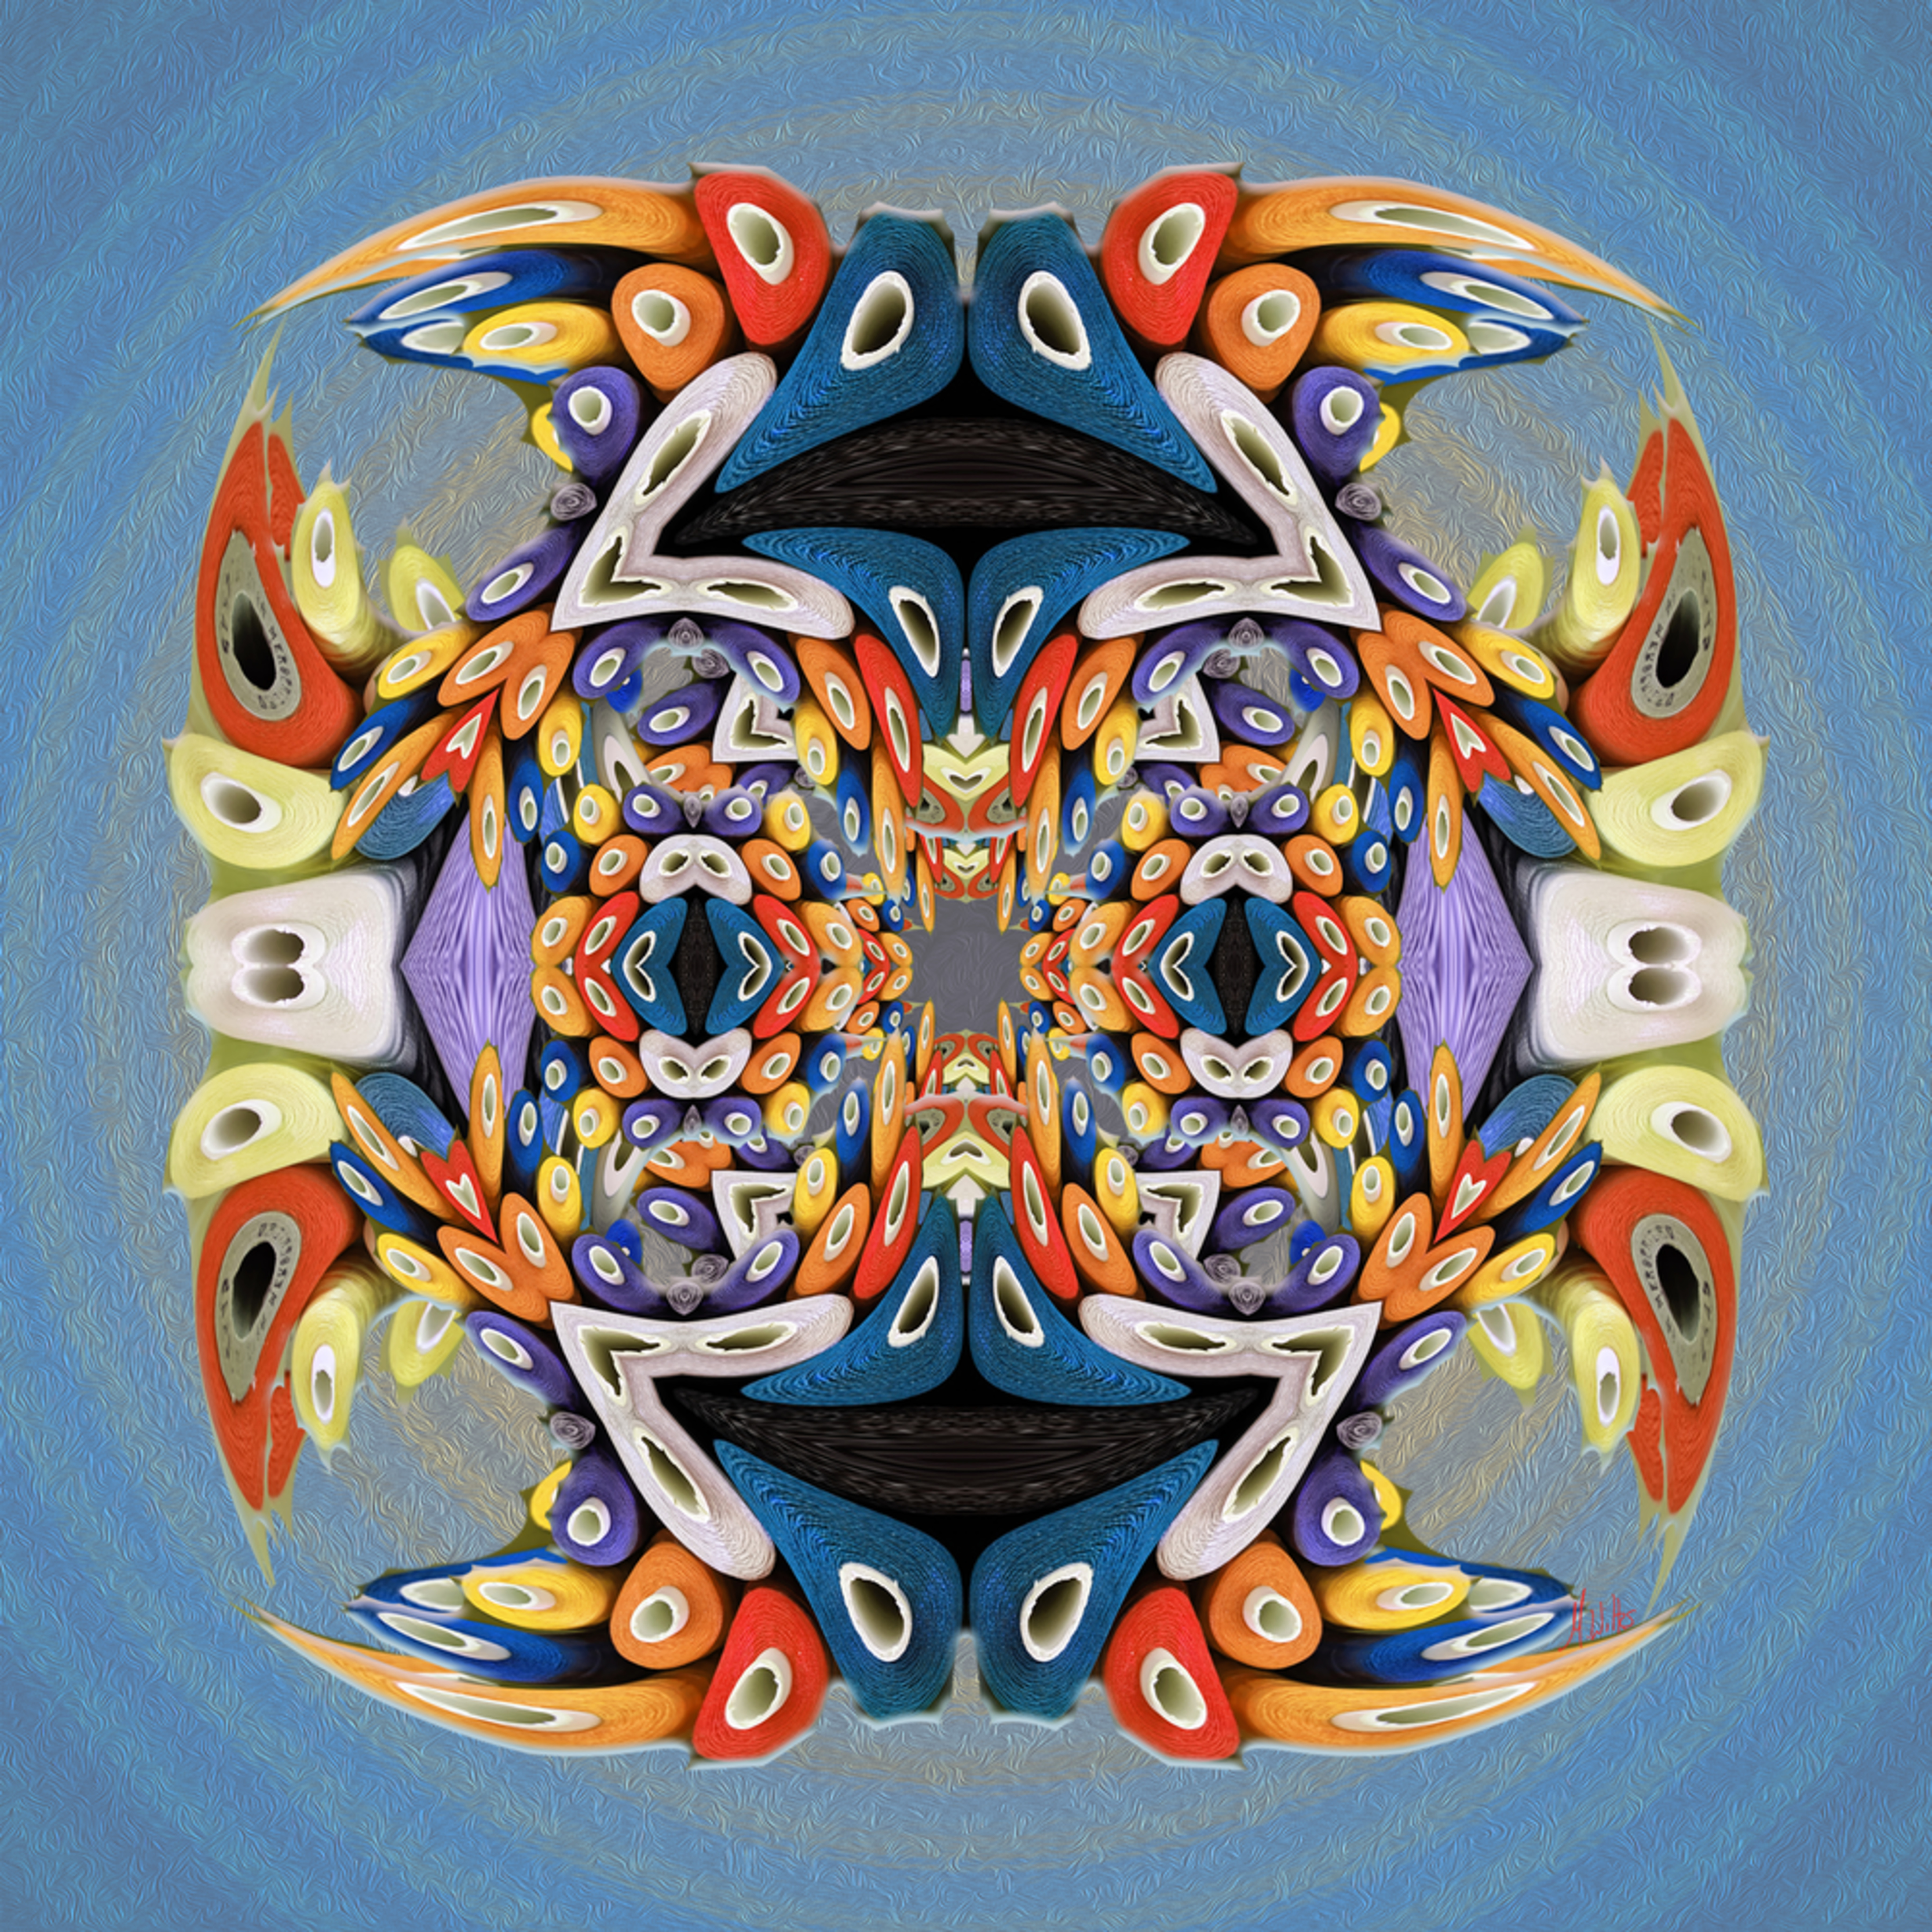 Spoolfaces03 blue dxabbe